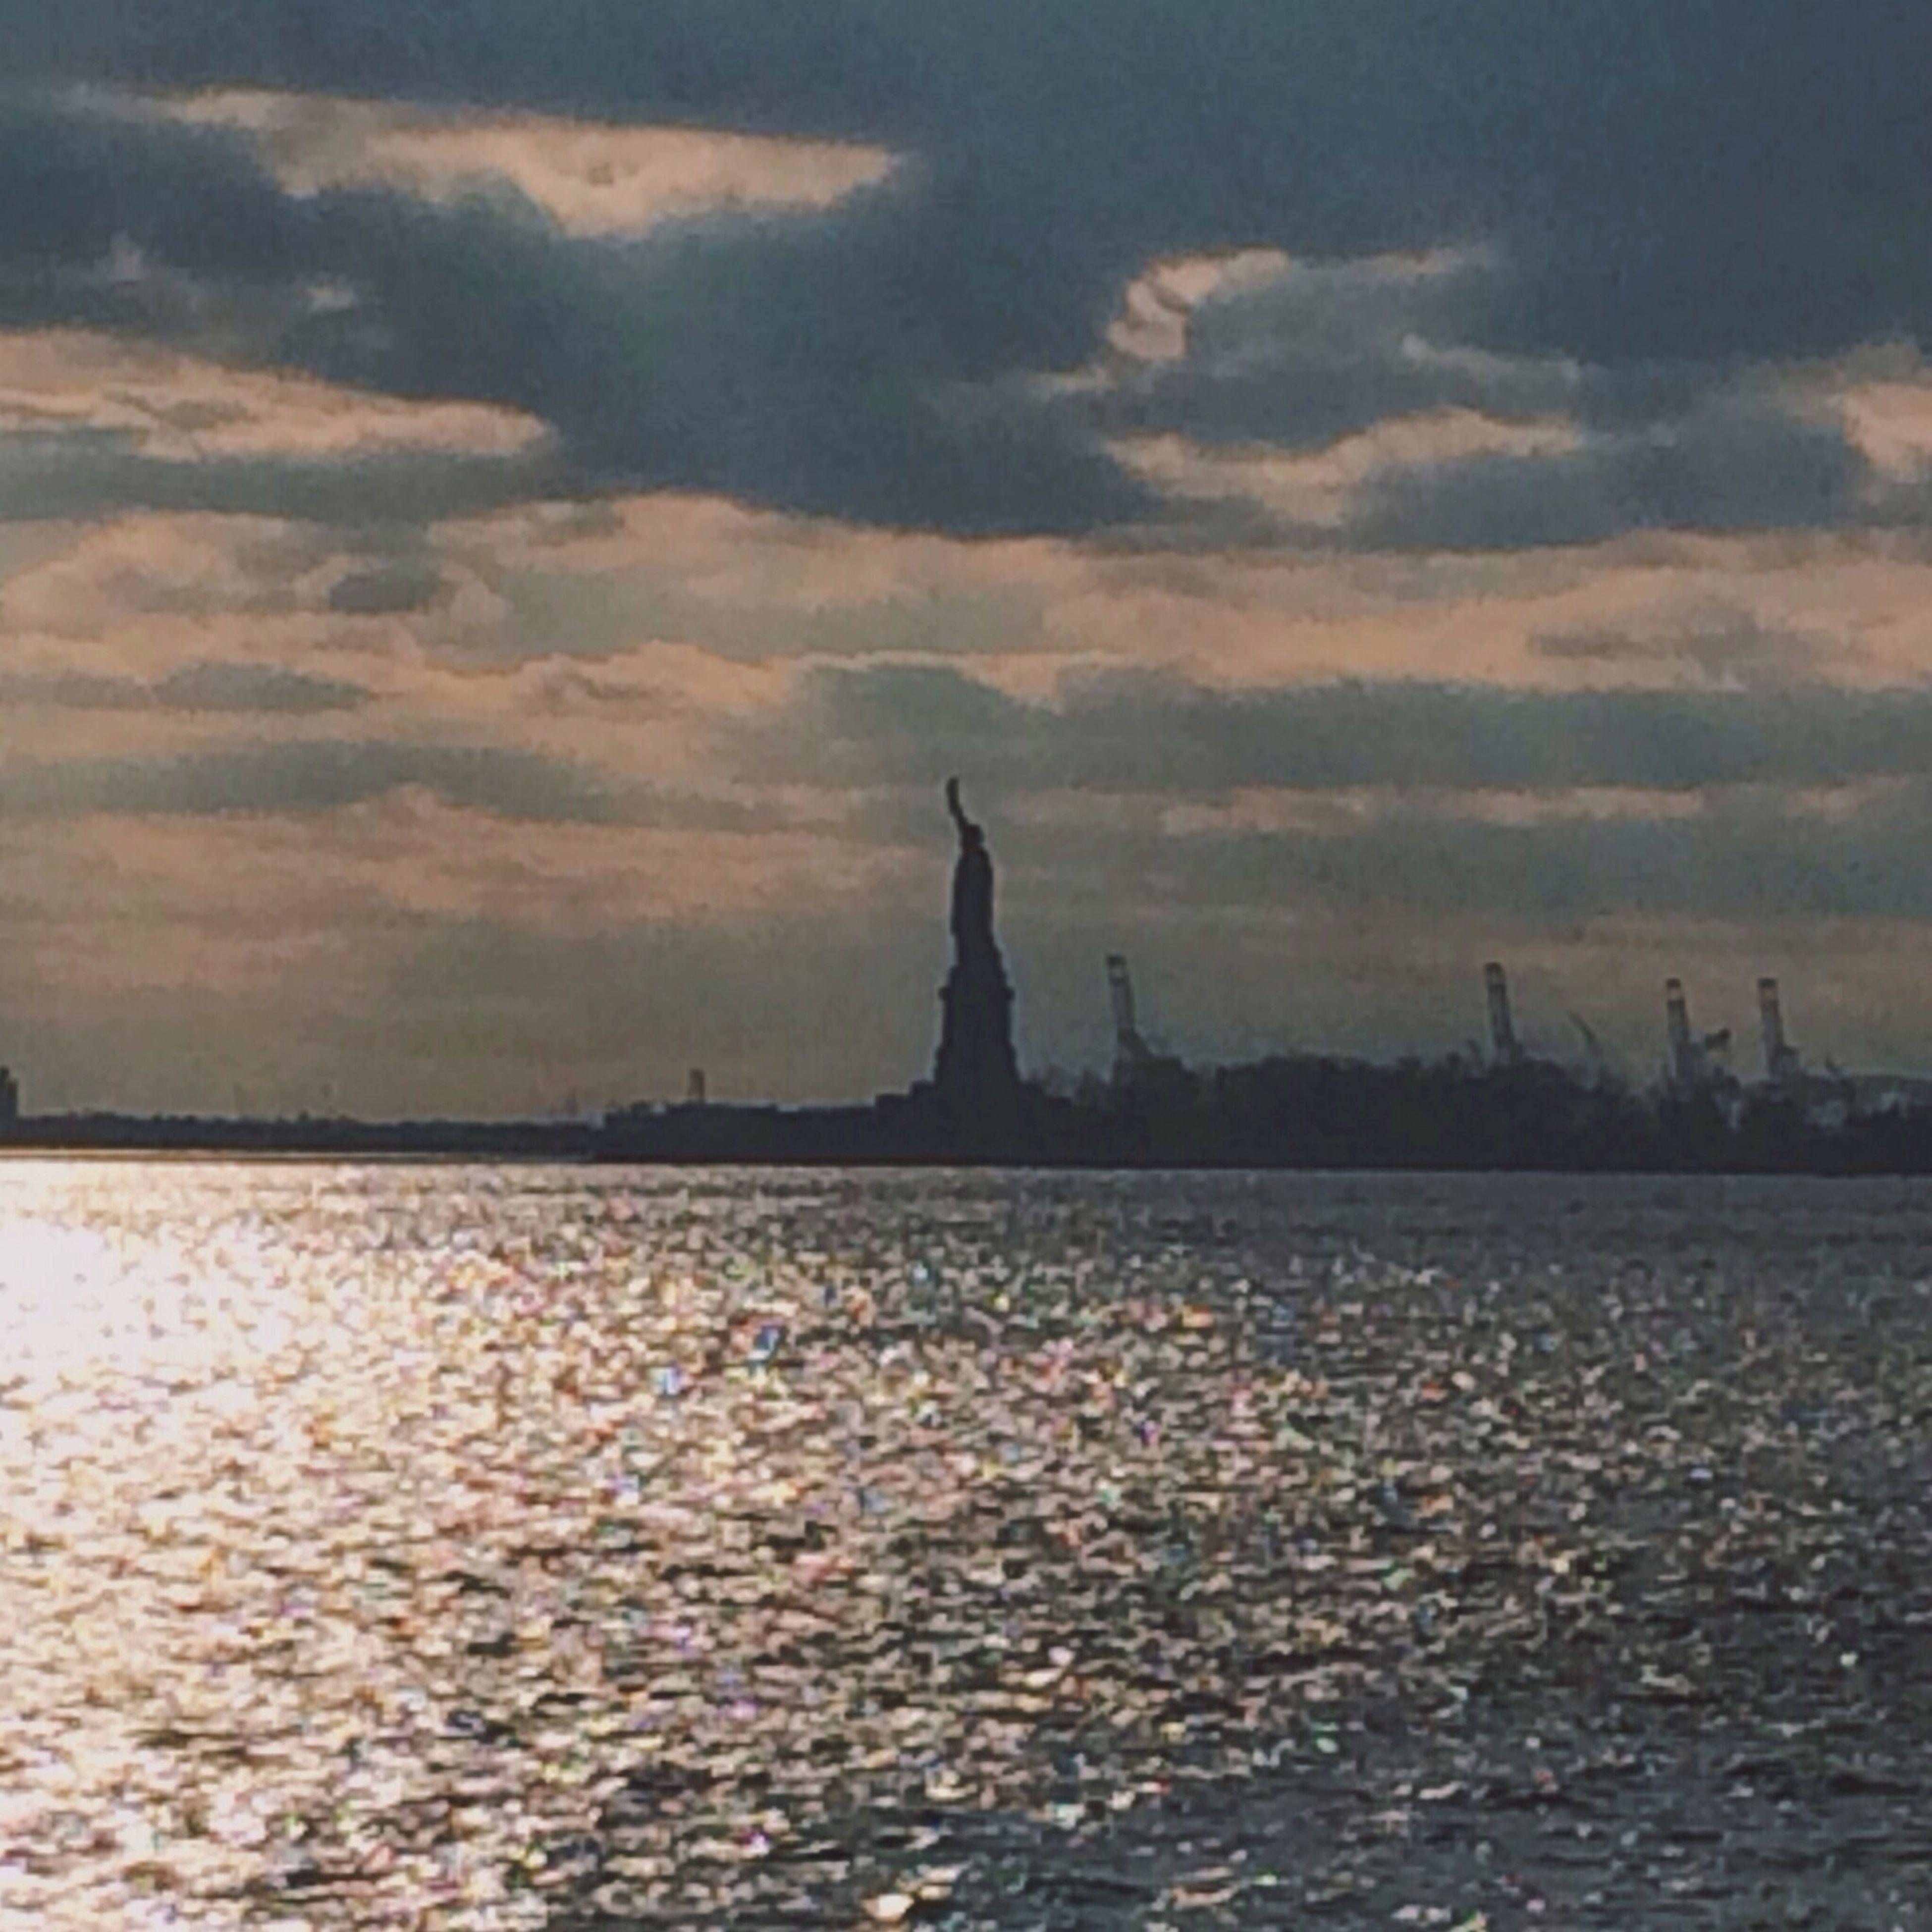 sky, water, sunset, architecture, built structure, building exterior, cloud - sky, silhouette, waterfront, statue, religion, cloudy, sculpture, human representation, dusk, spirituality, famous place, travel destinations, place of worship, sea